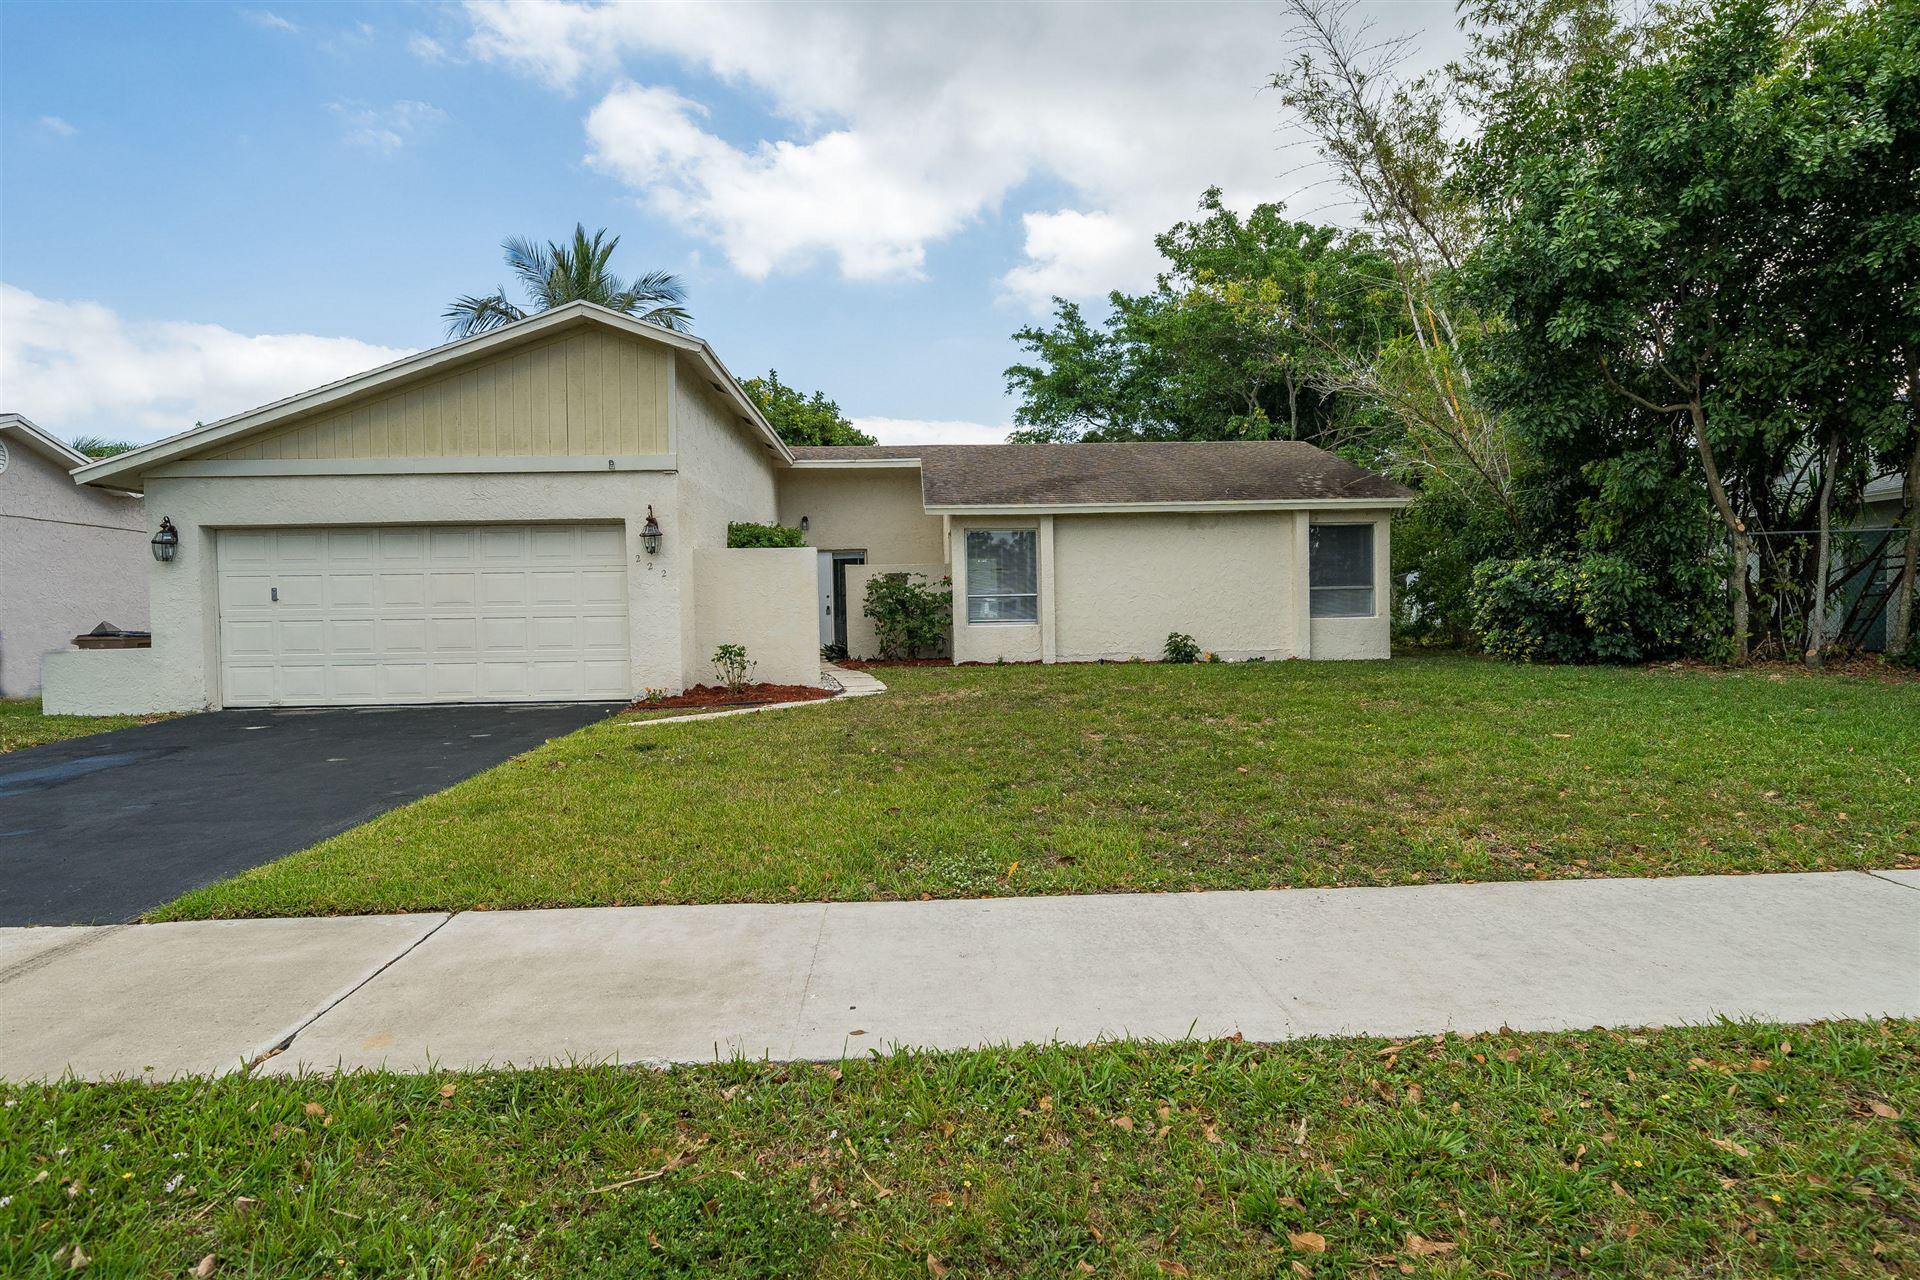 222 NW 41st Avenue, Deerfield Beach, FL 33442 - #: RX-10701760